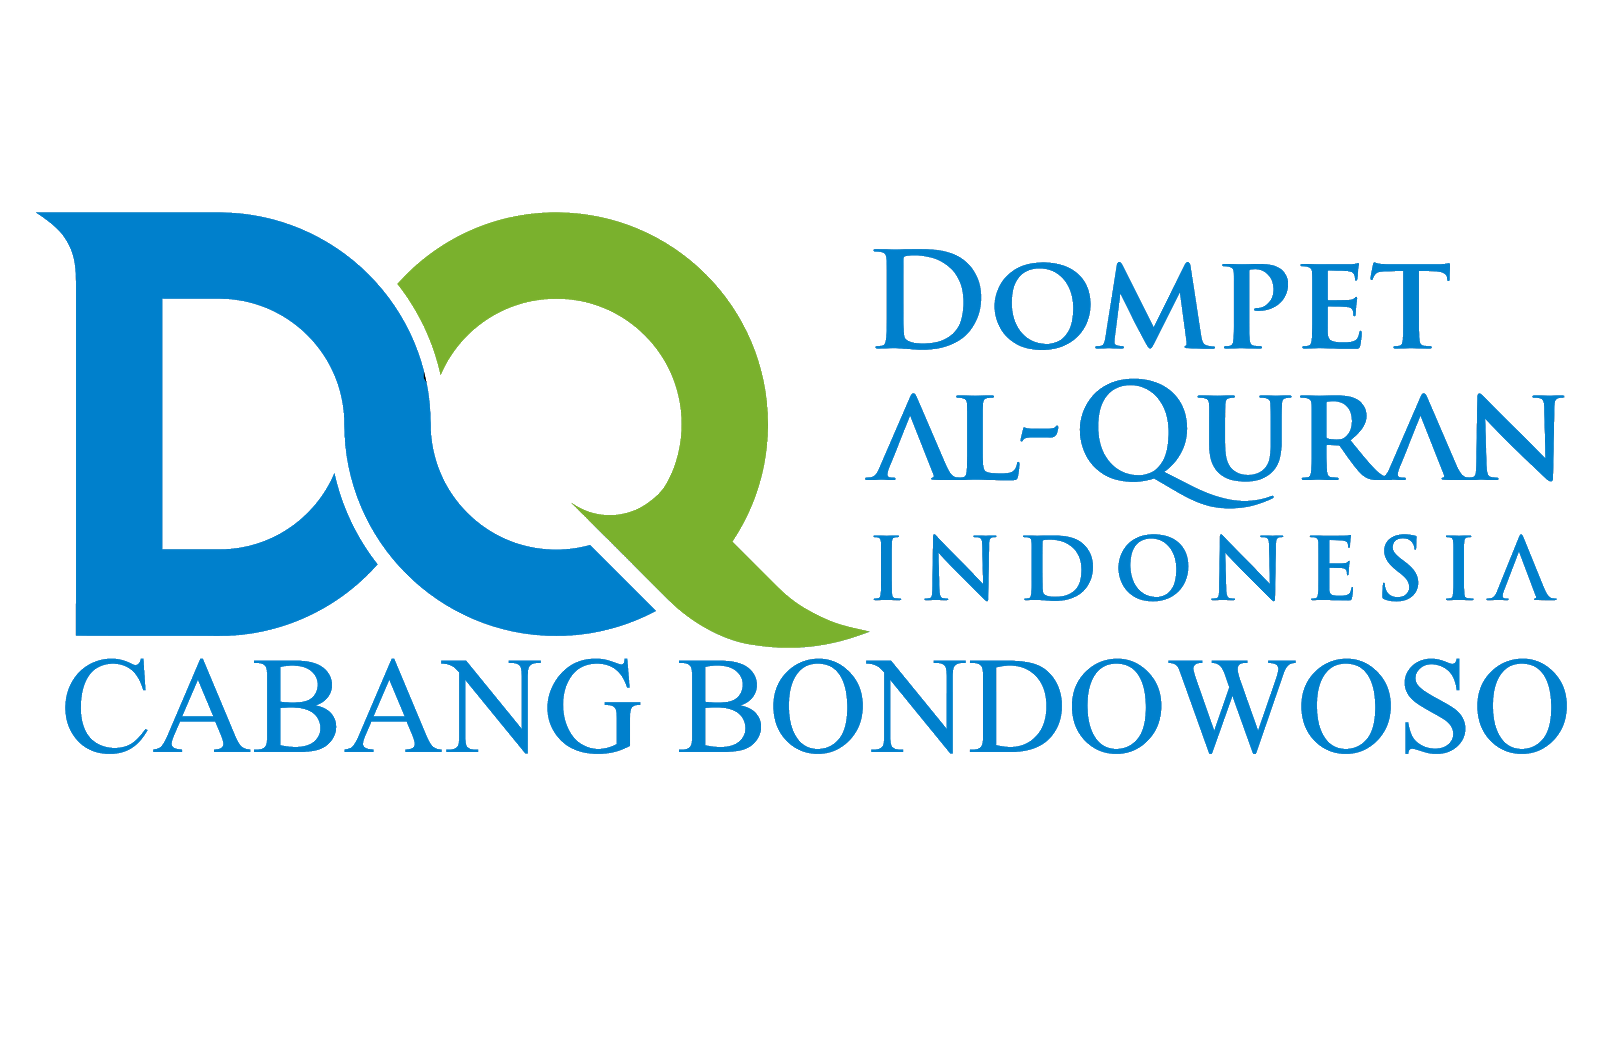 Dompet Al Qur'an Indonesia Cabang Bondowoso